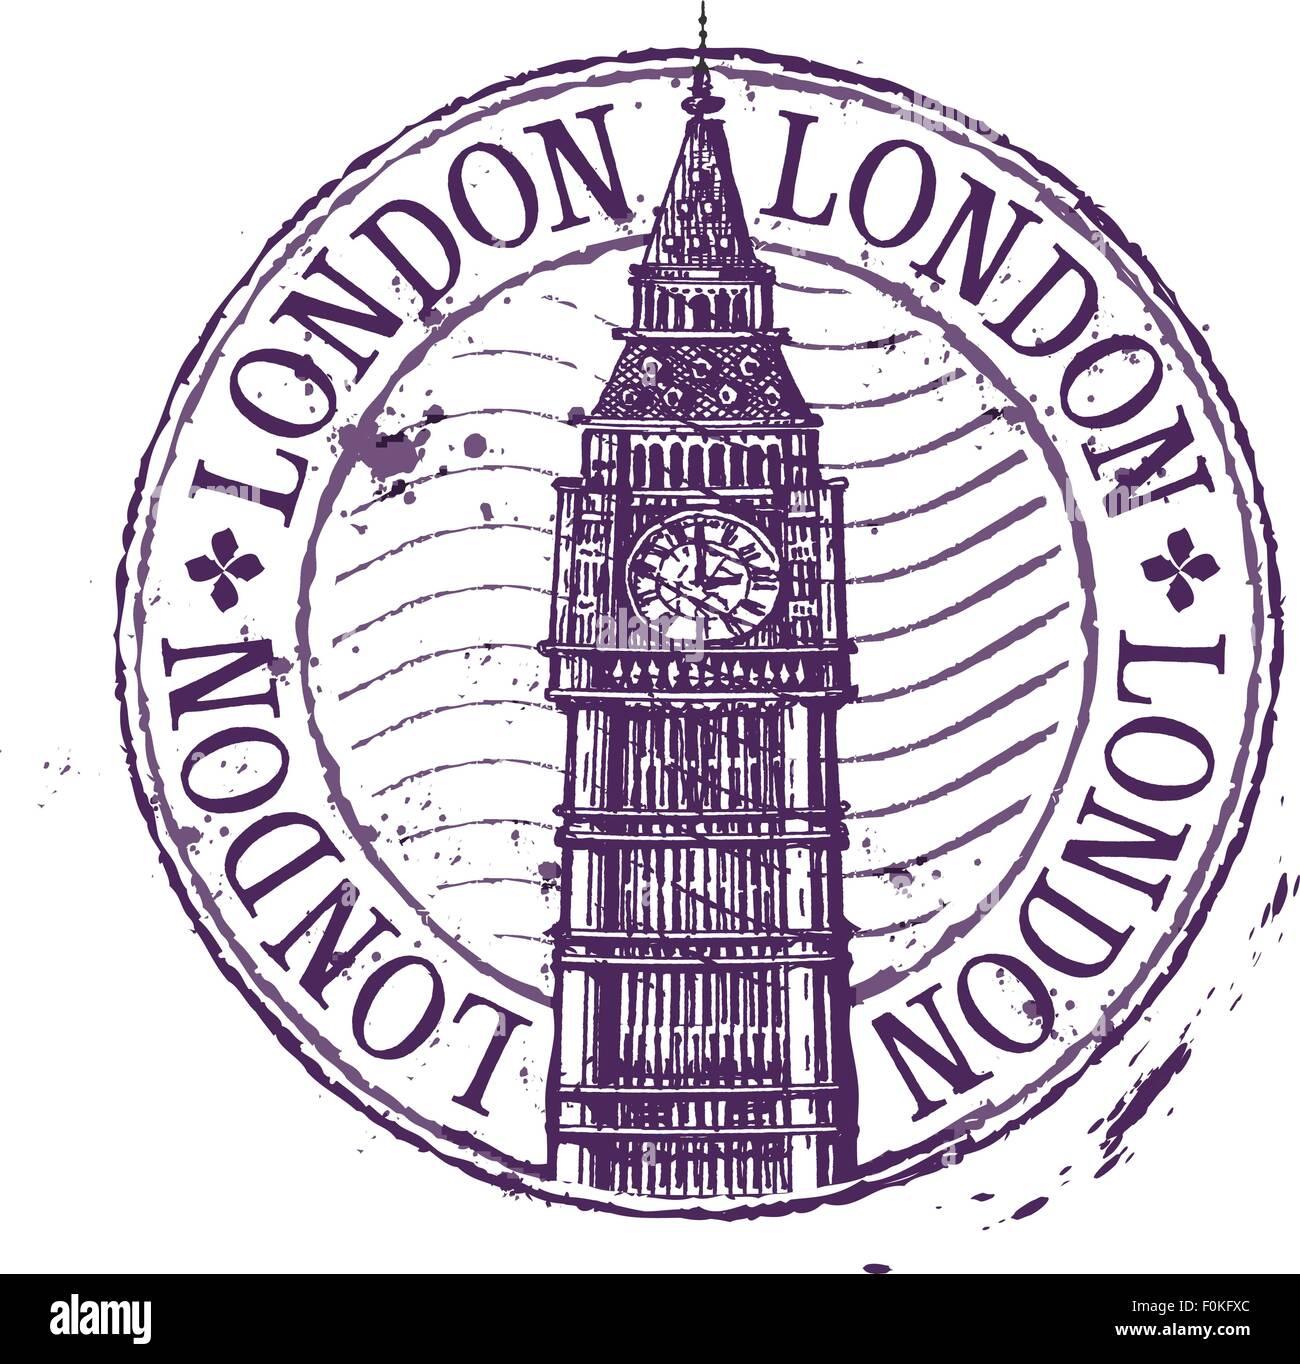 London-Vektor-Logo-Design-Vorlage. Schäbige Stempel oder England ...